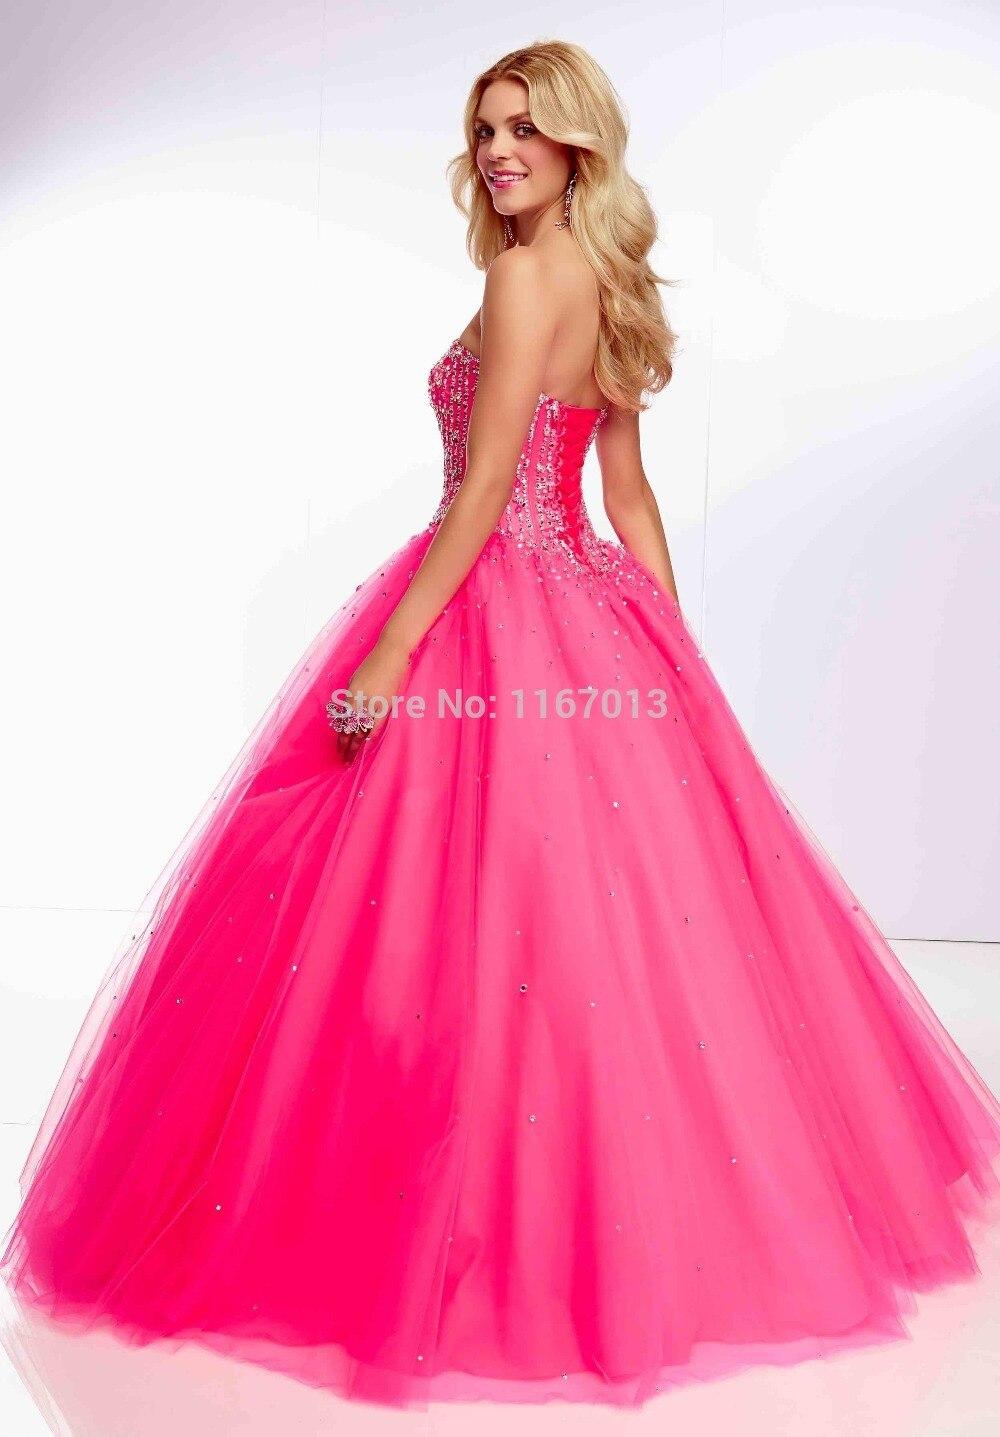 Vestidos para la bola de noche reino unido Plus Size Prom vestido ...